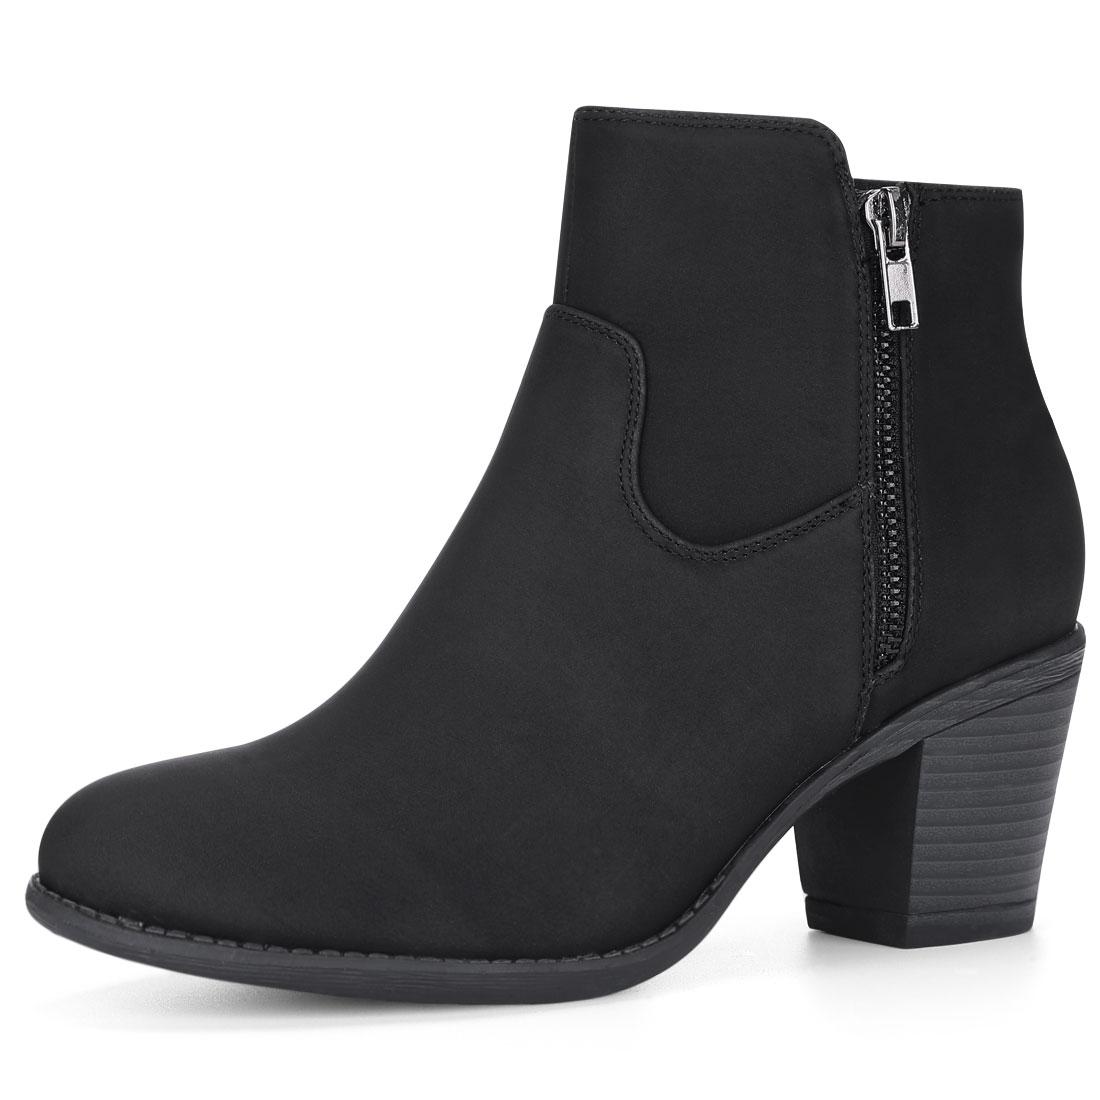 Allegra K Women Round Toe Stacked Chunky Heel Zipper Ankle Boots Black US 6.5